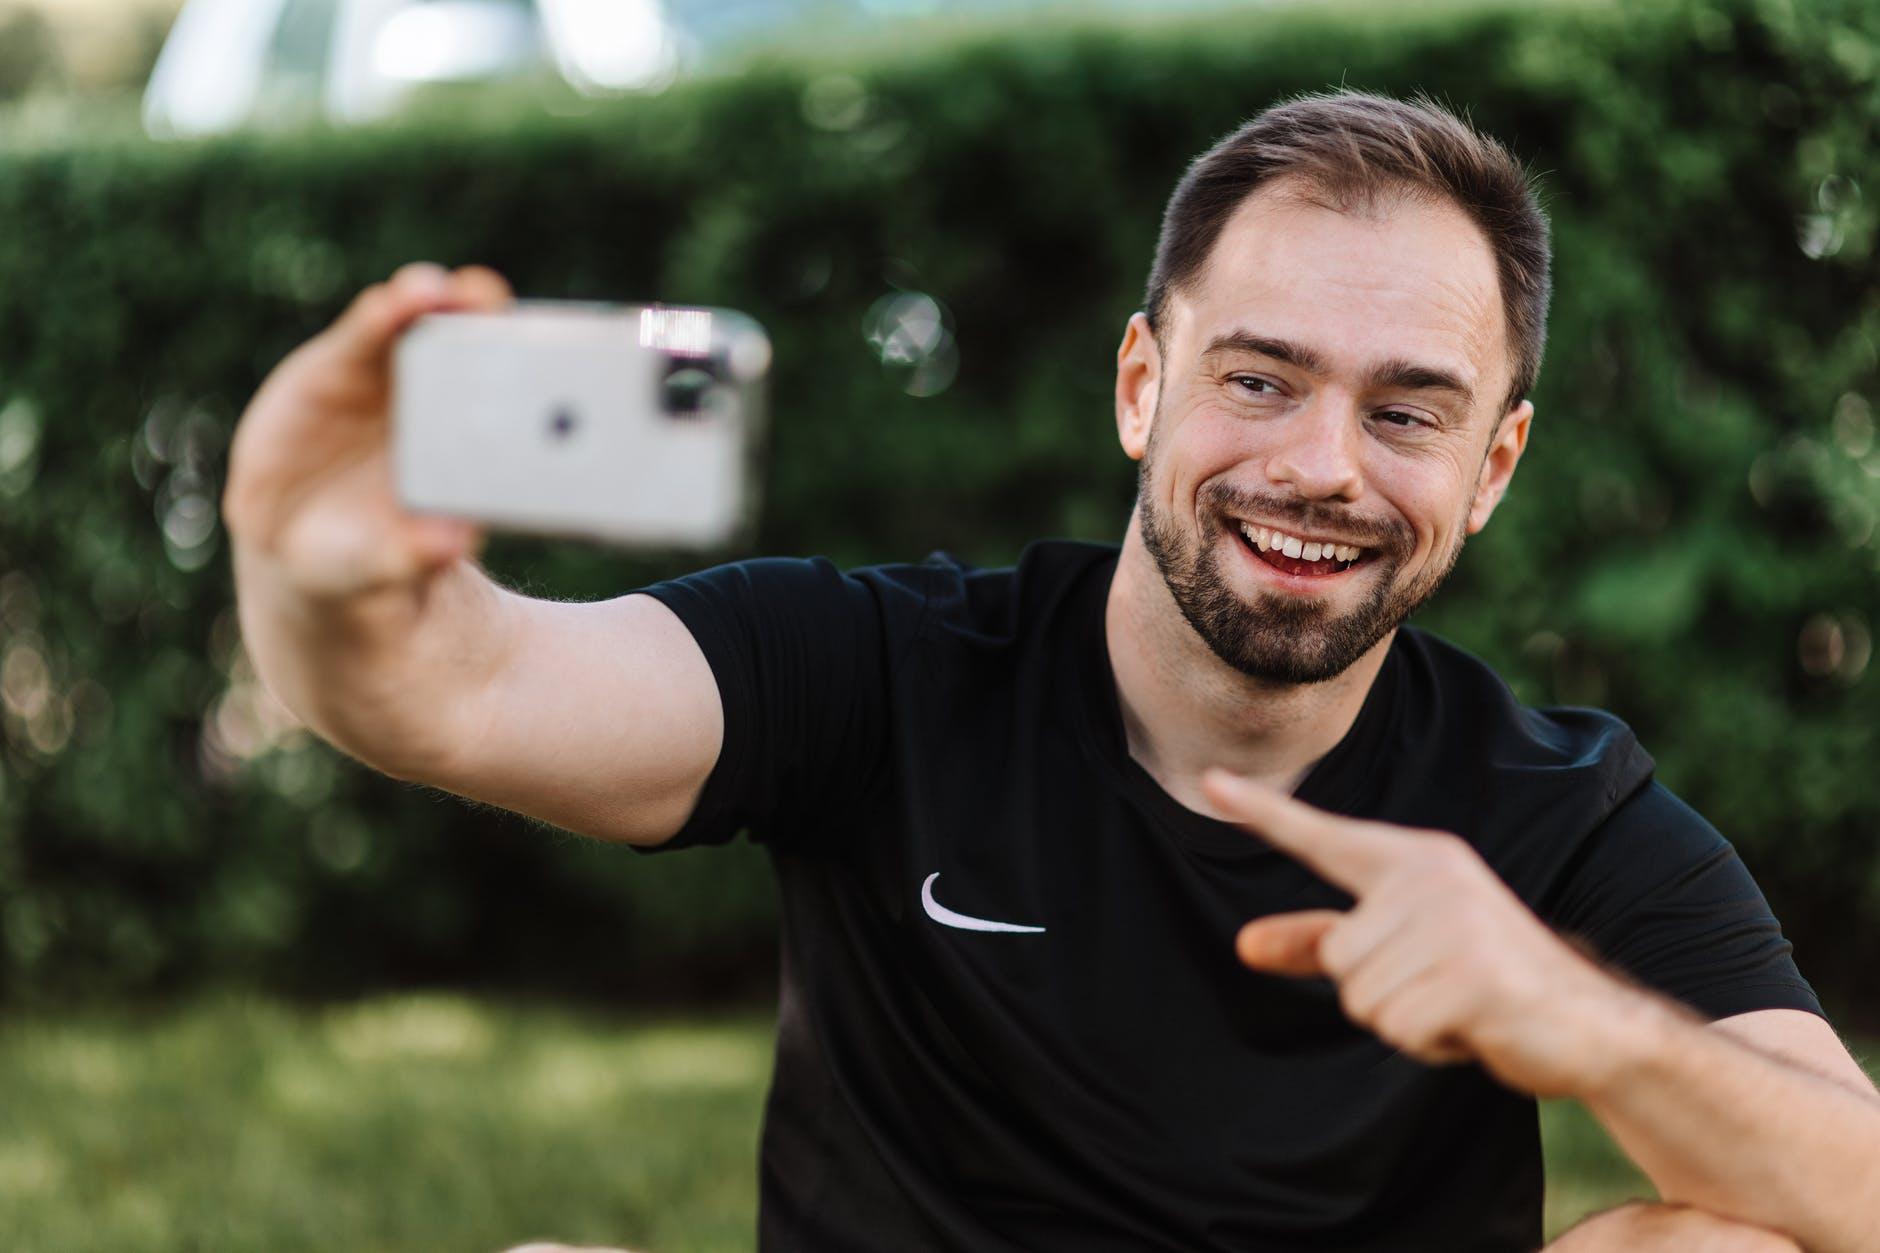 fotke koje sheramo na društvenim mrežama  smiling man in black shirt taking a selfie